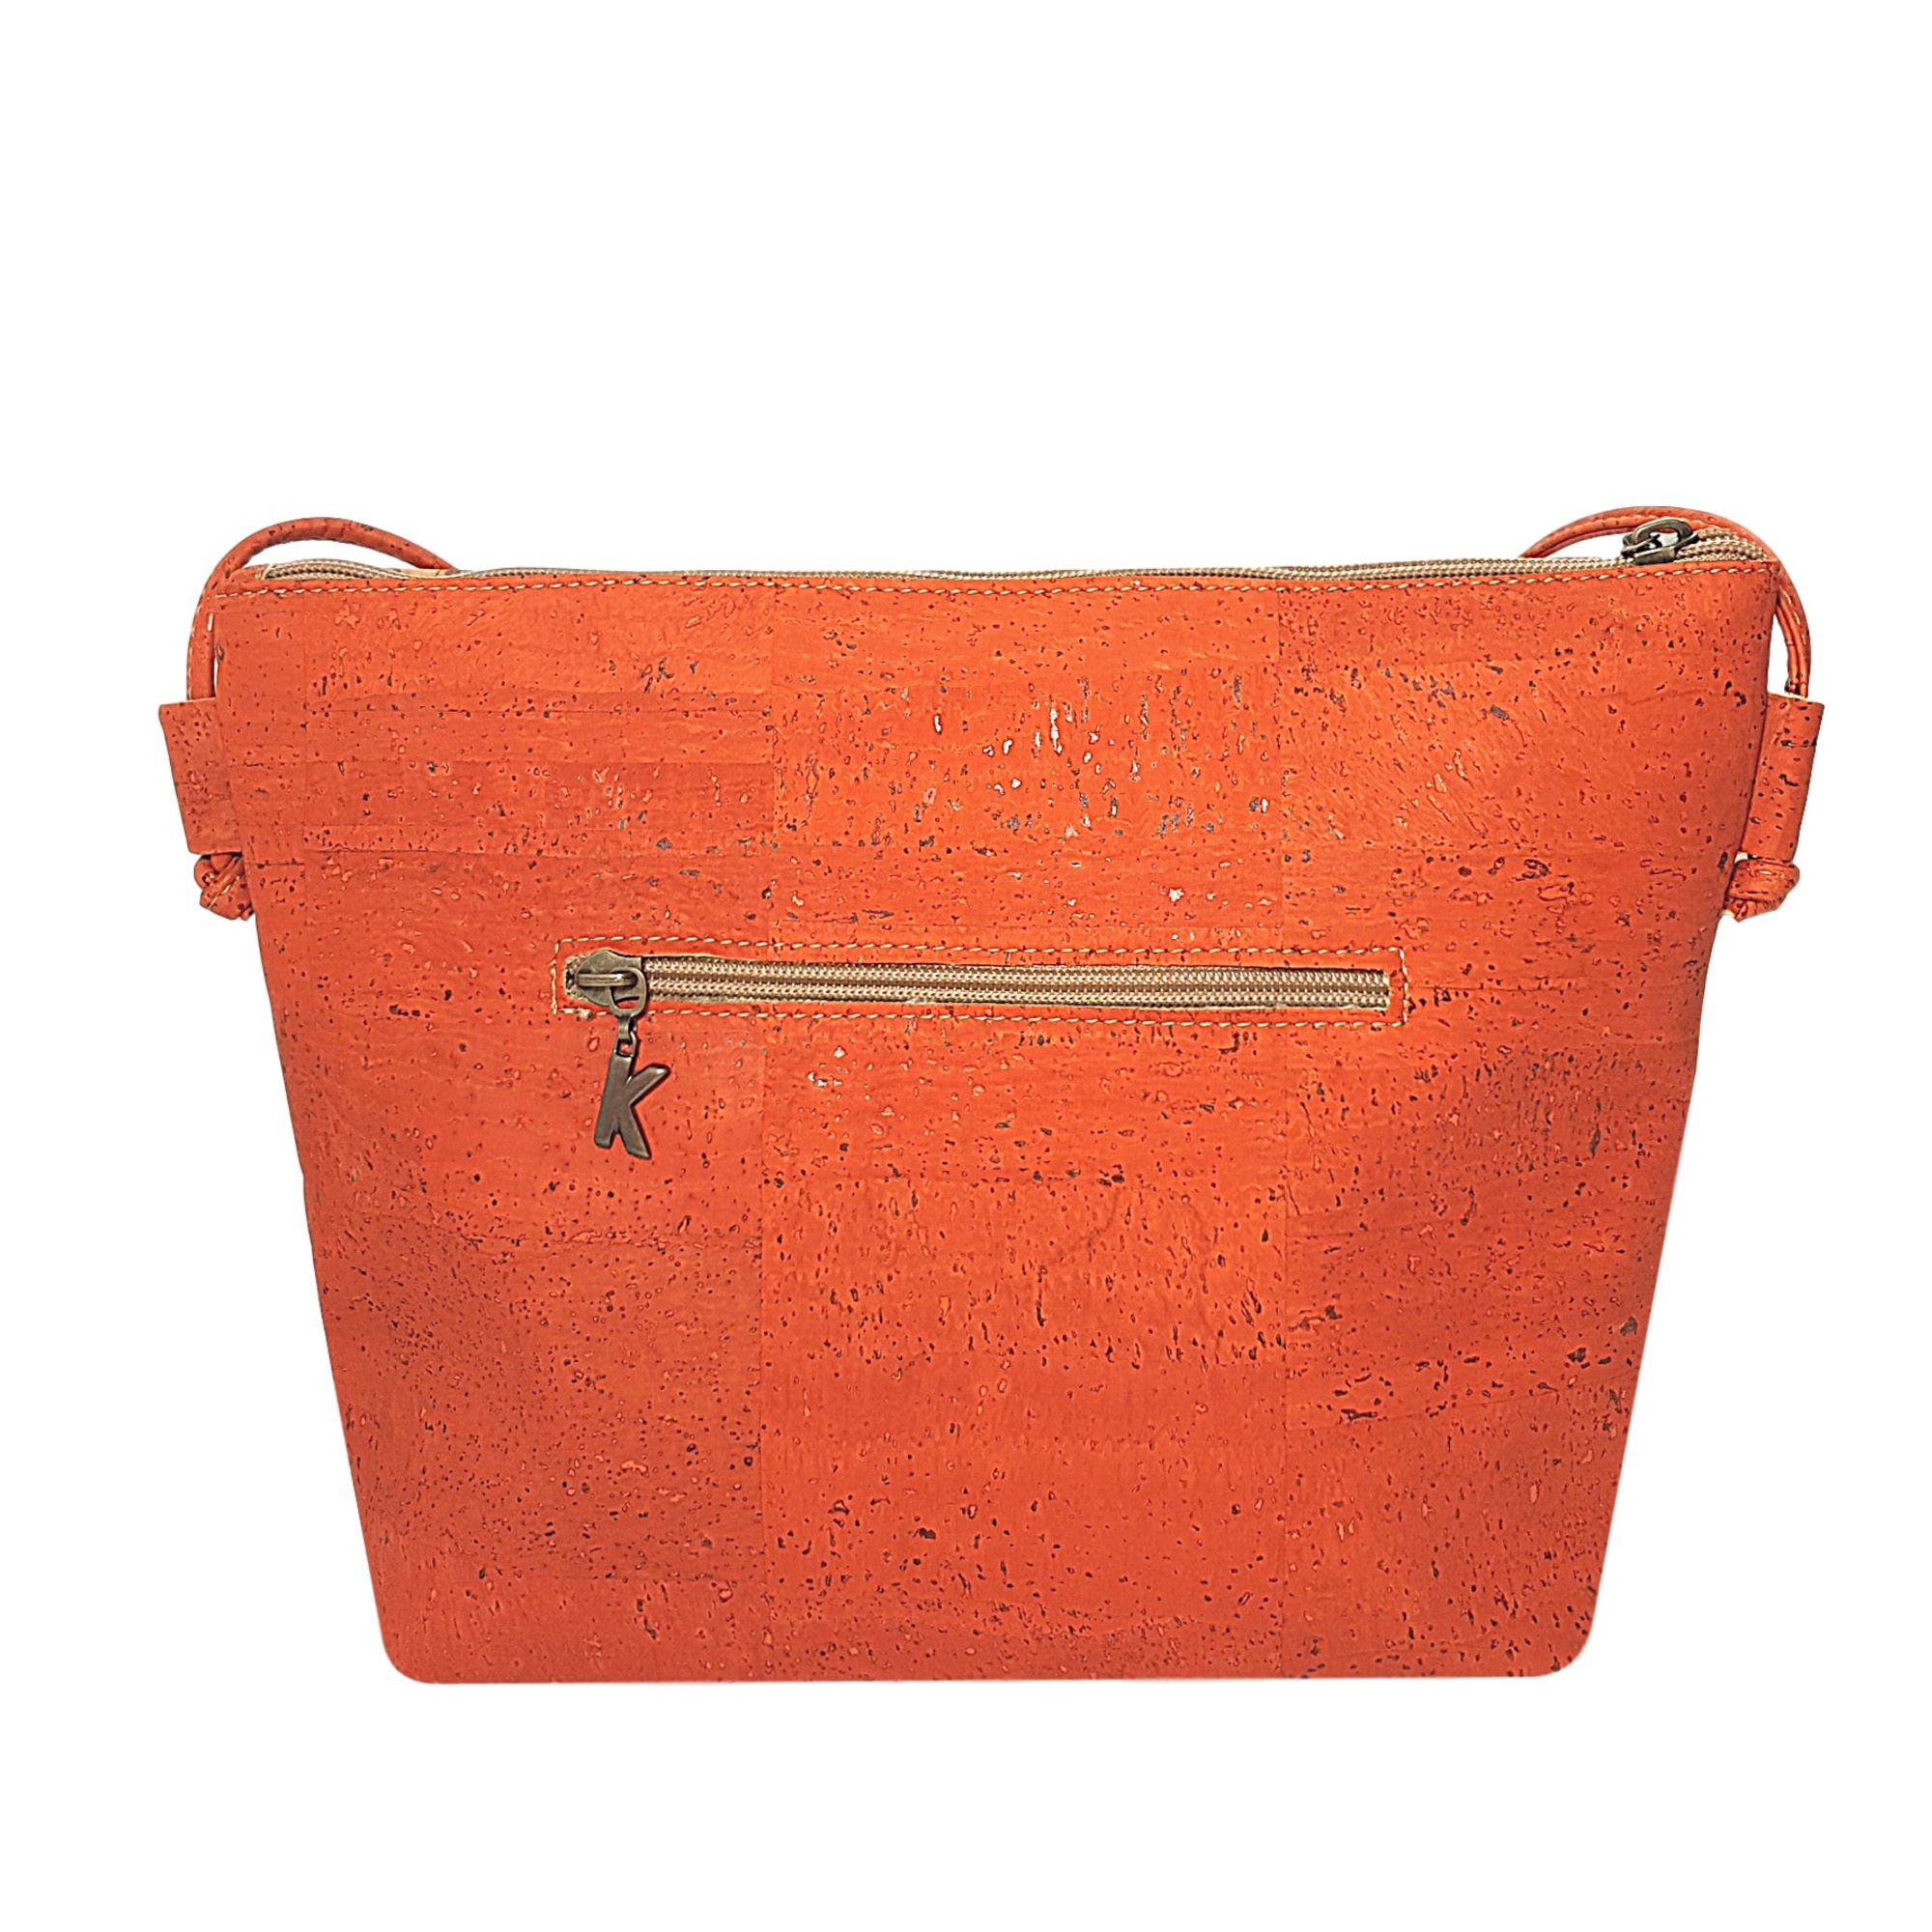 Geanta crossbody oranj-floral